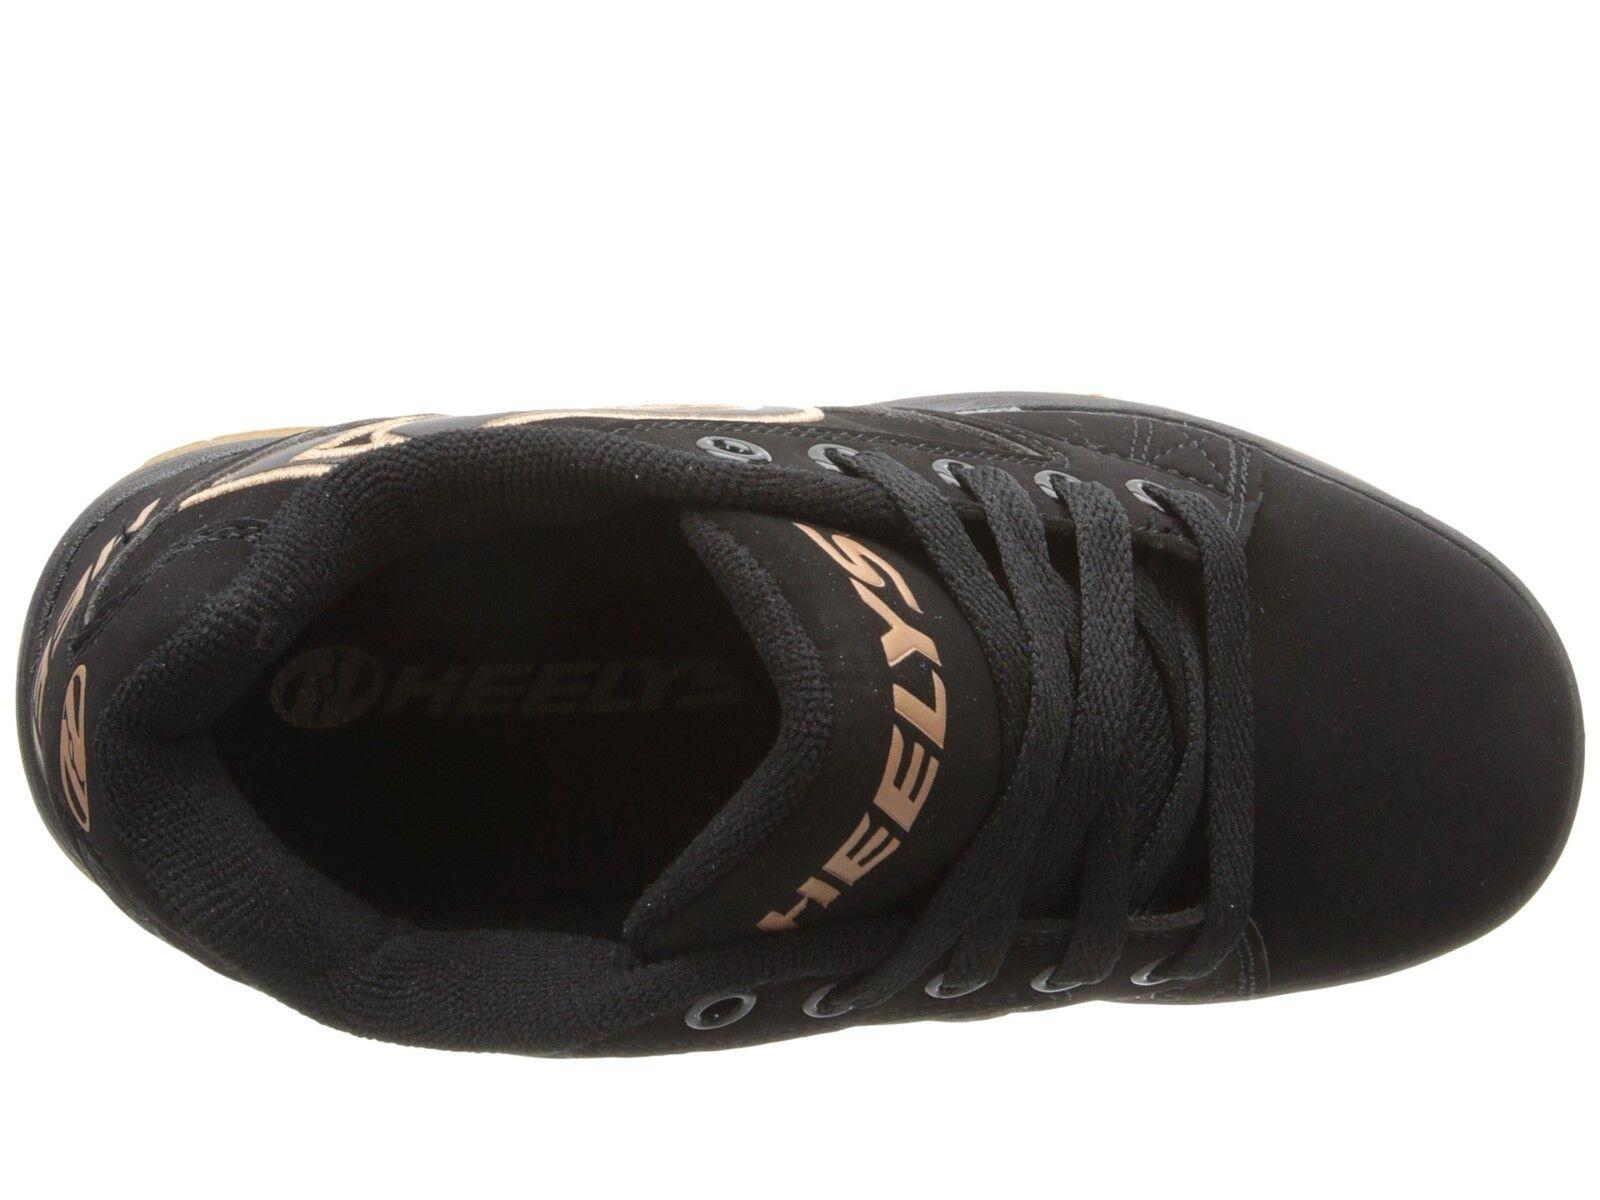 New Heelys Heelys New Propel 2.0 Wheeled Turnschuhe SZ Youth 1 2 3 4 5 6 ROLLER SKATE Schuhe f623bc